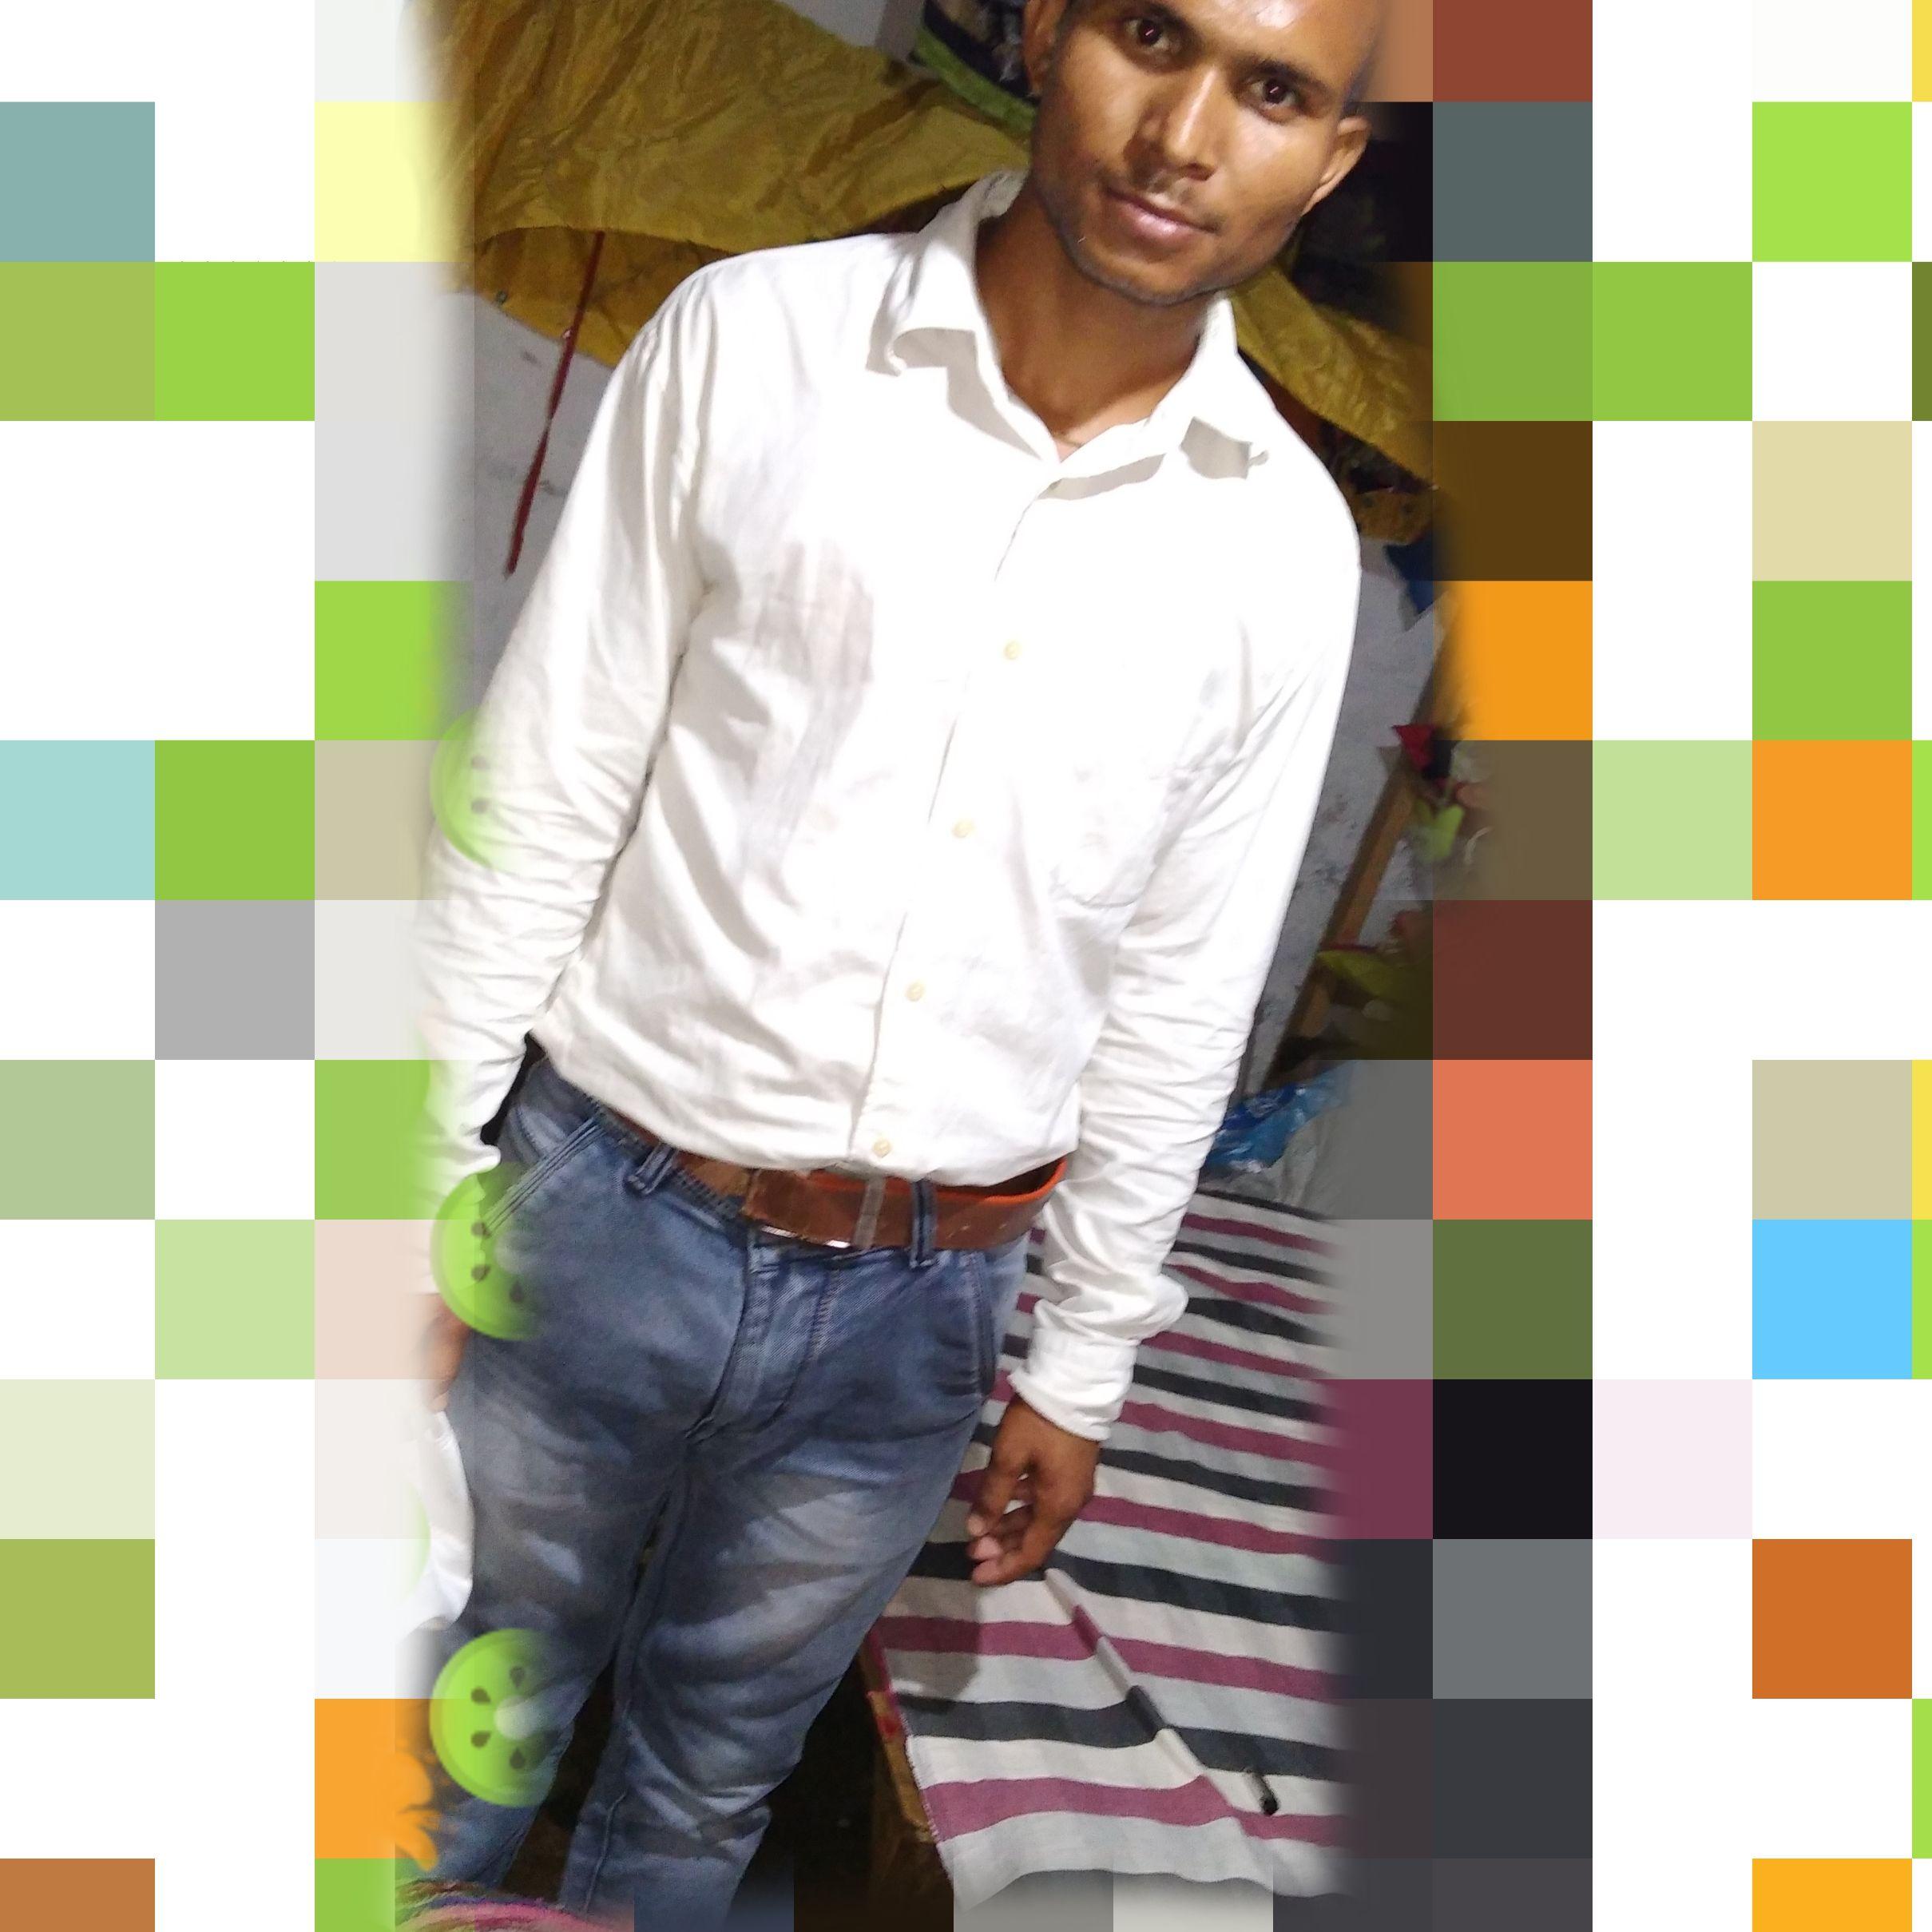 My Name Is  Suchen Kumar